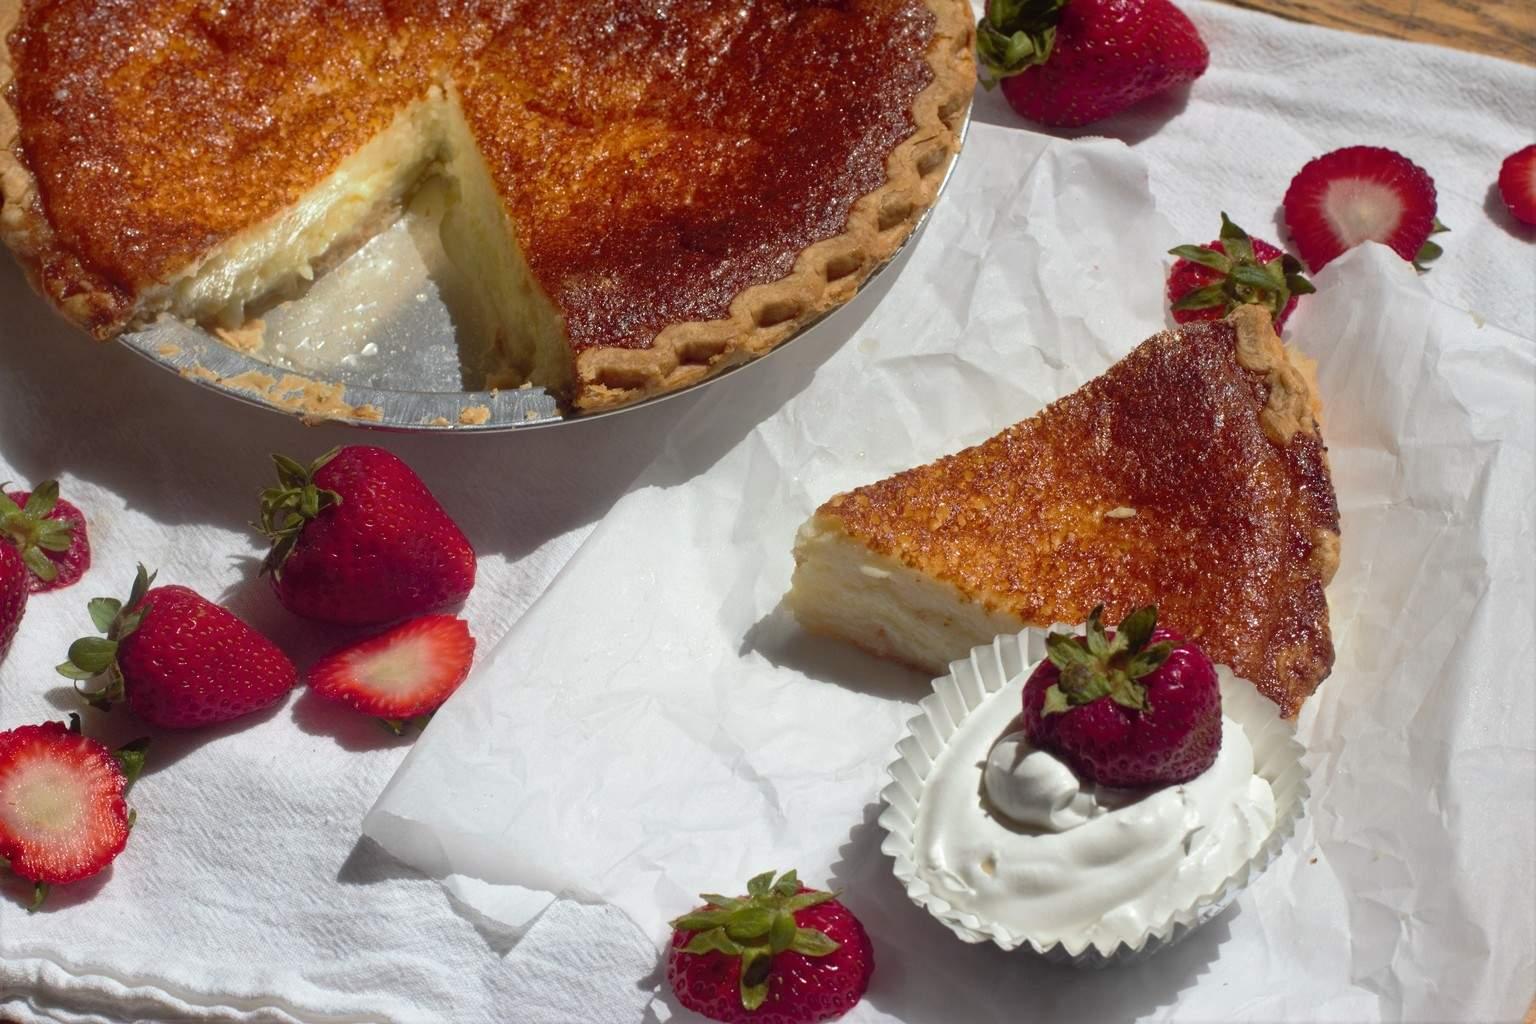 Southern Buttermilk Pie